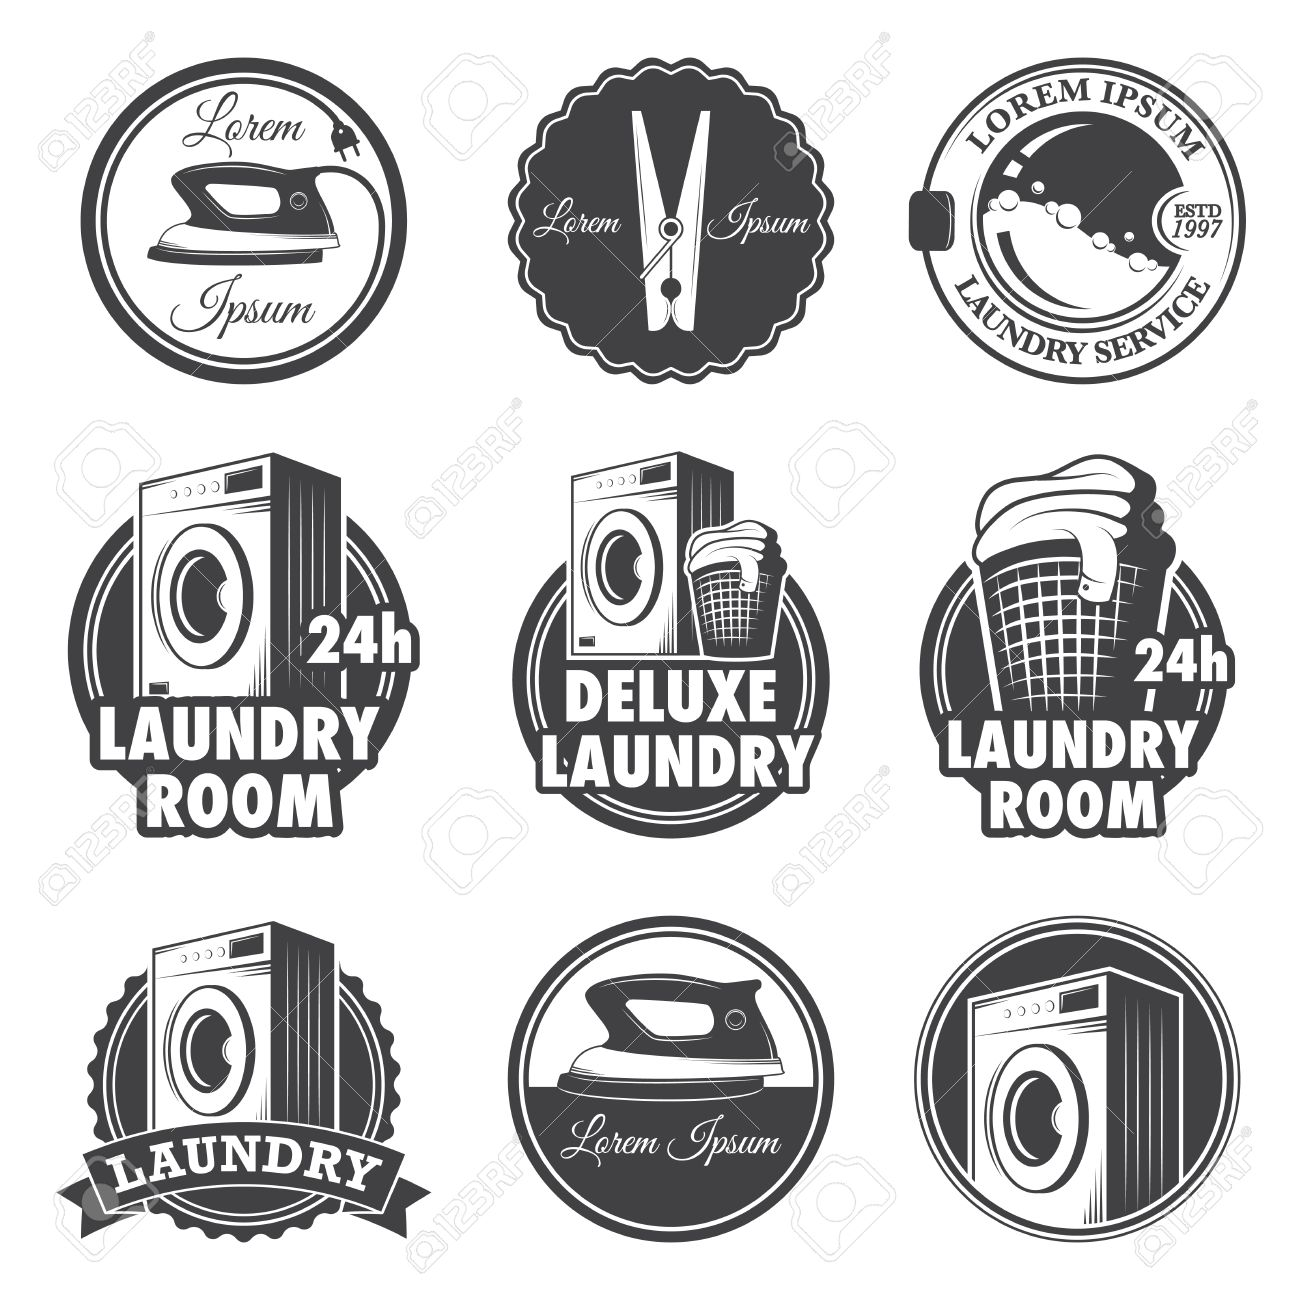 Set Of Vintage Laundry Emblems Labels And Designed Elements Stock Vector